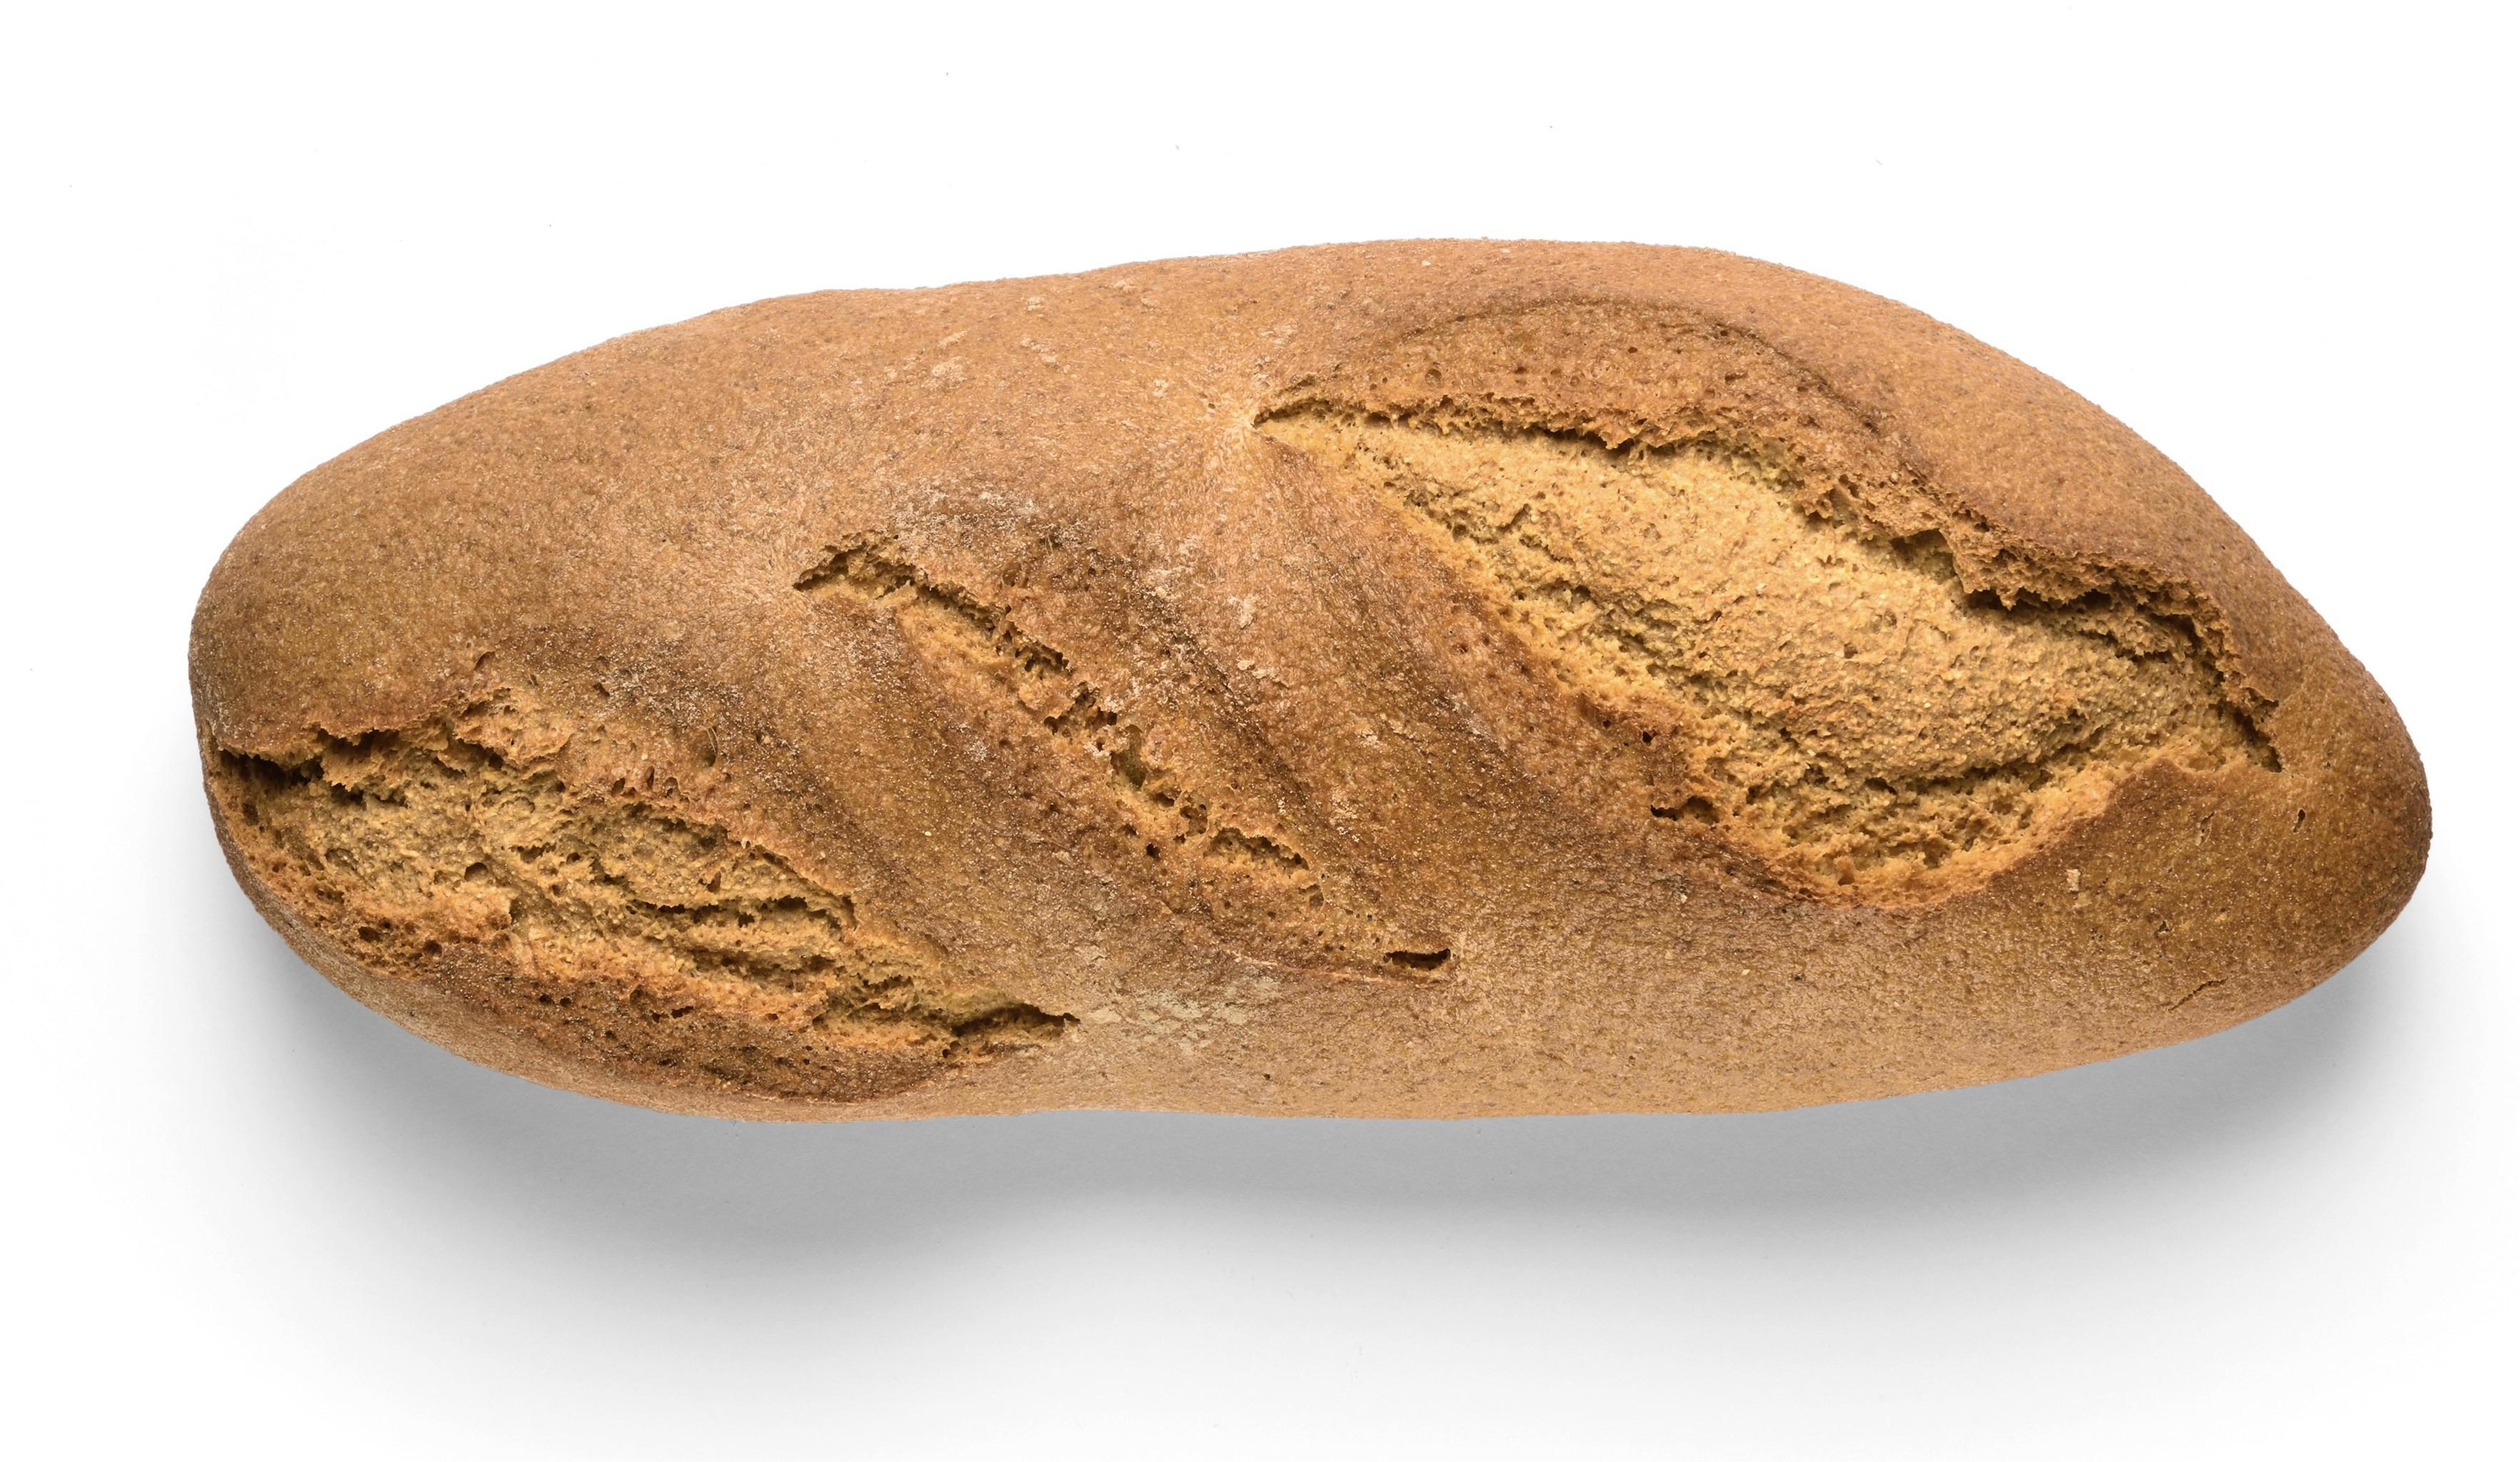 Pane di riso